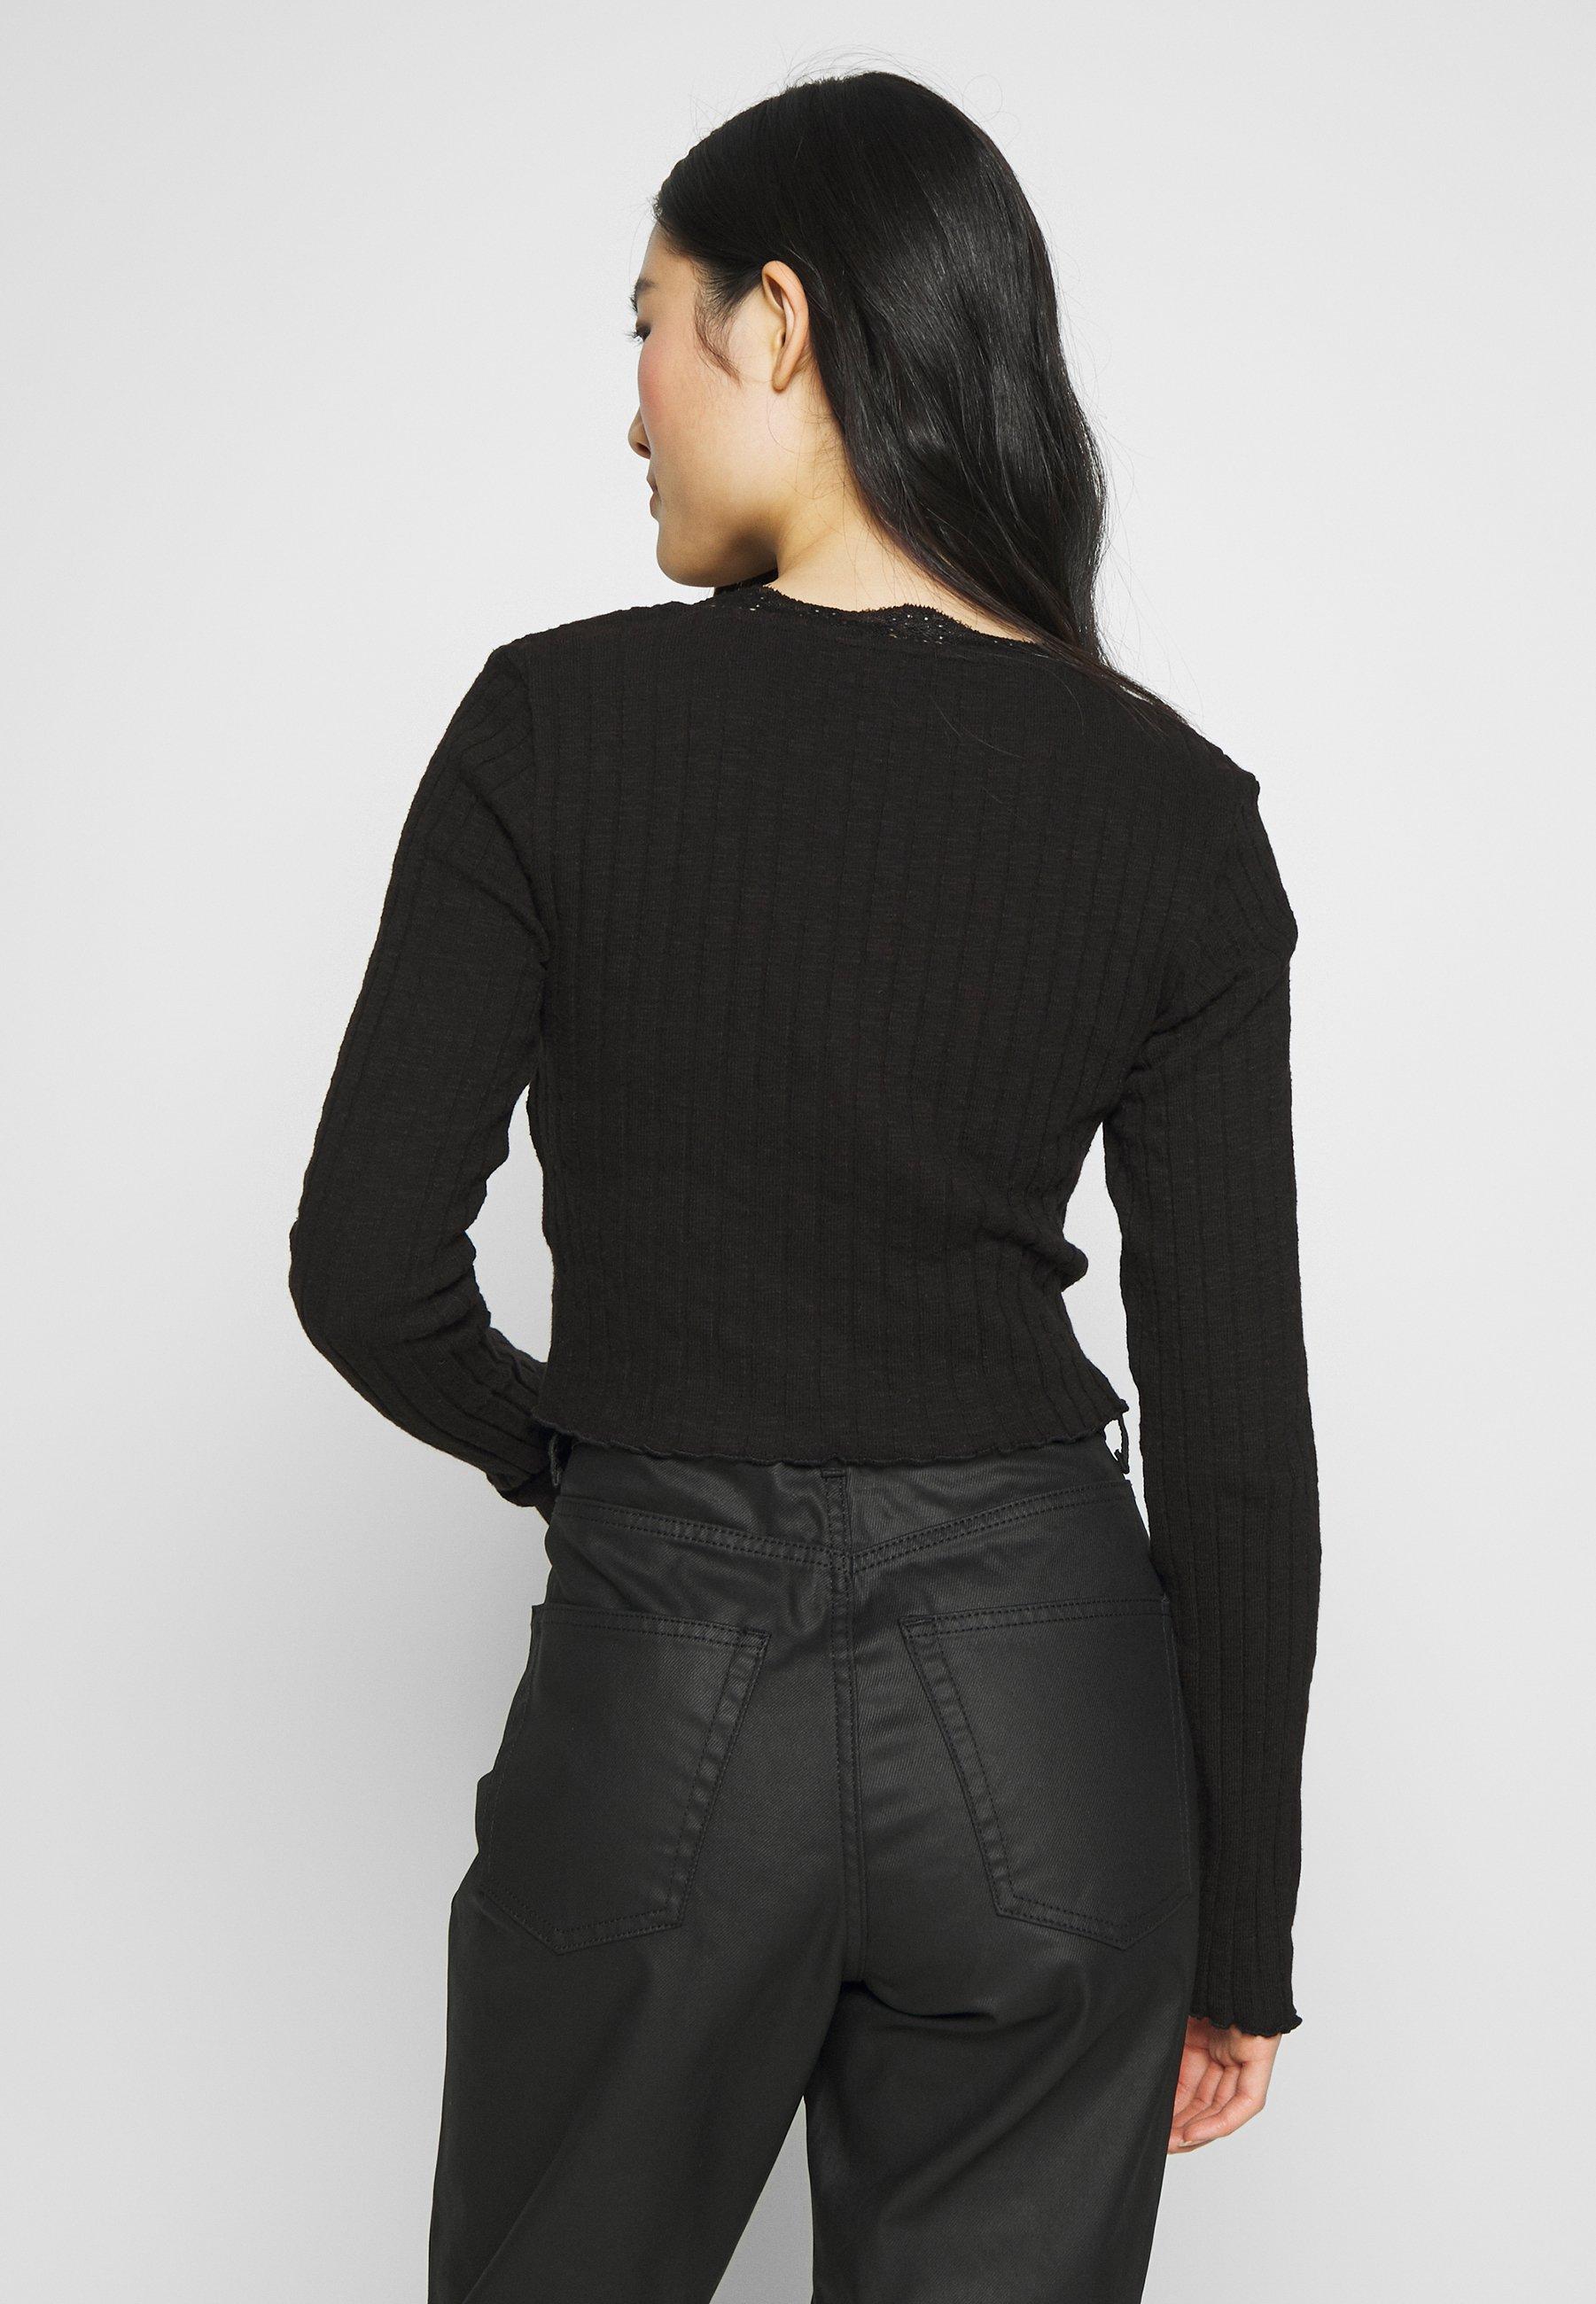 Topshop Cardi - T-shirt À Manches Longues Black